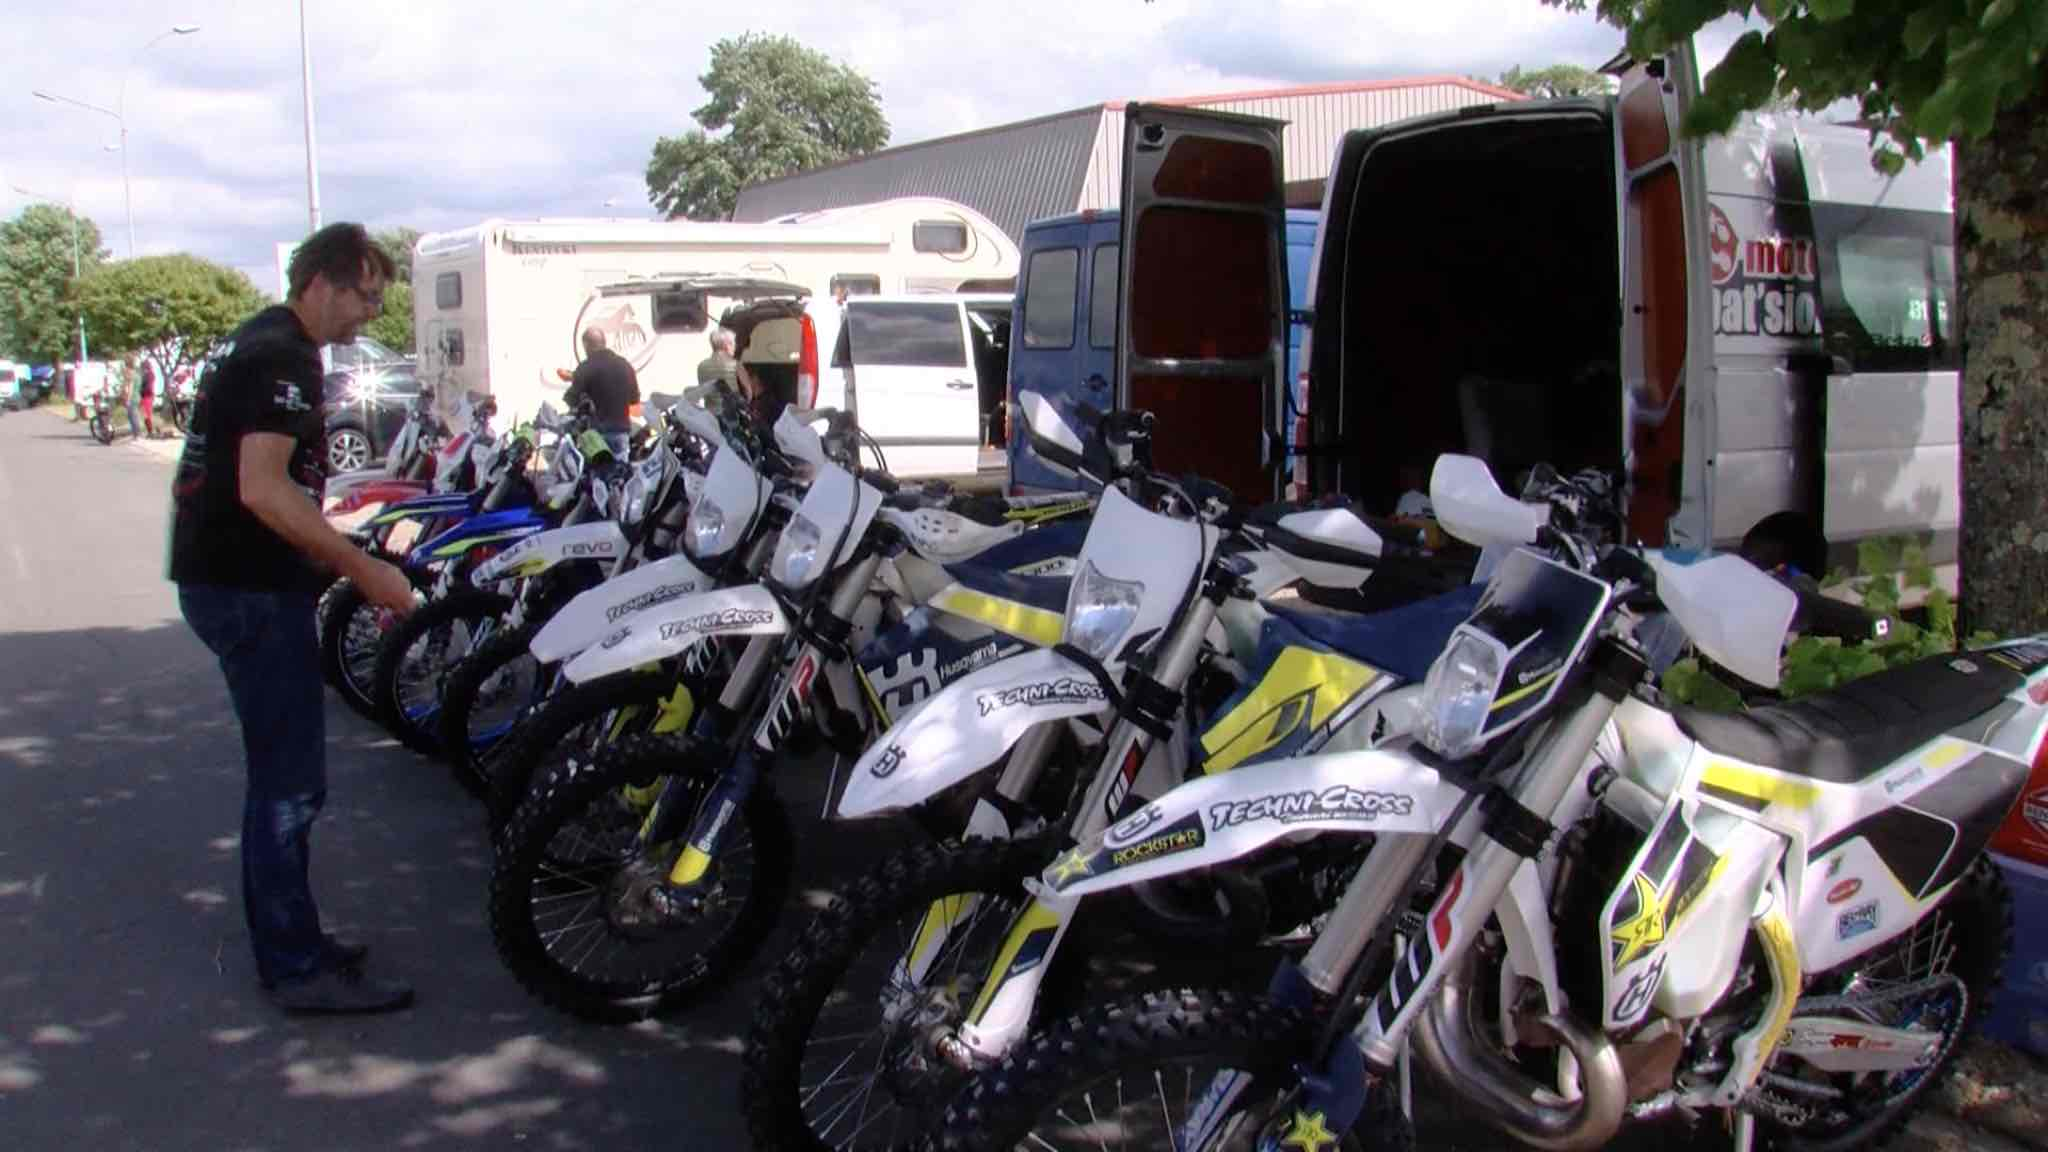 Moto : Trois jours à Bergerac avec l'Enduro Club Tournai